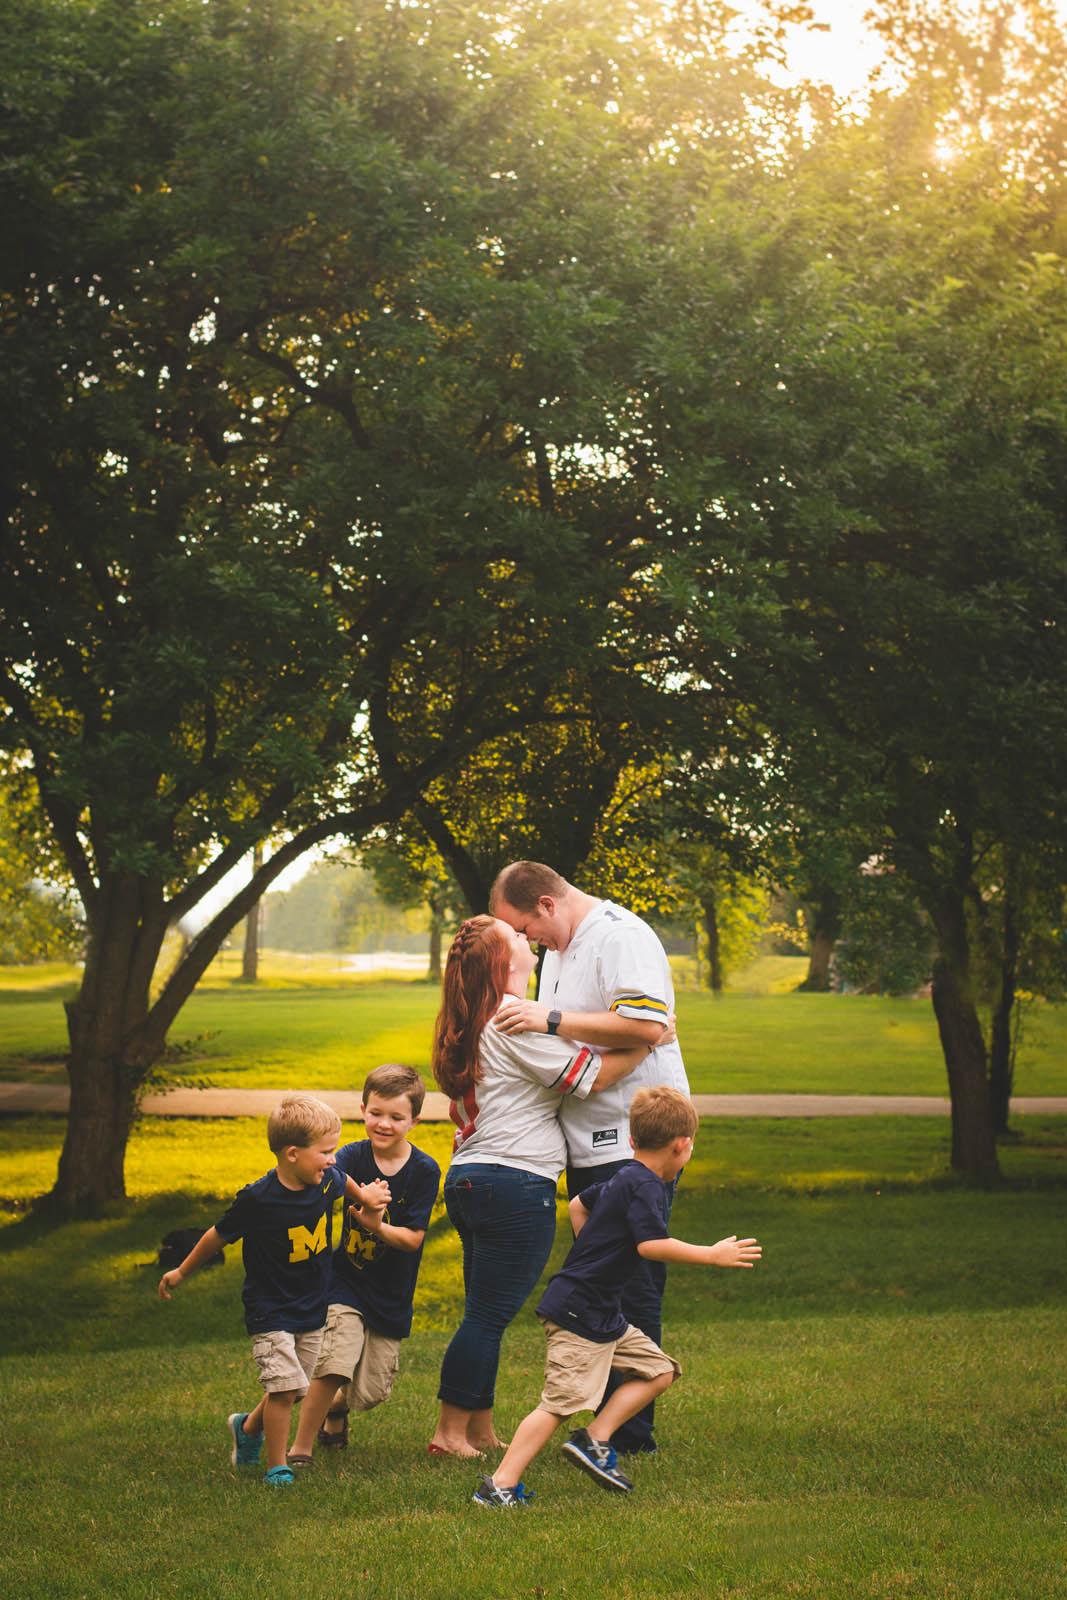 Family Portraits by Brooke Ashley Photography in Dayton Ohio